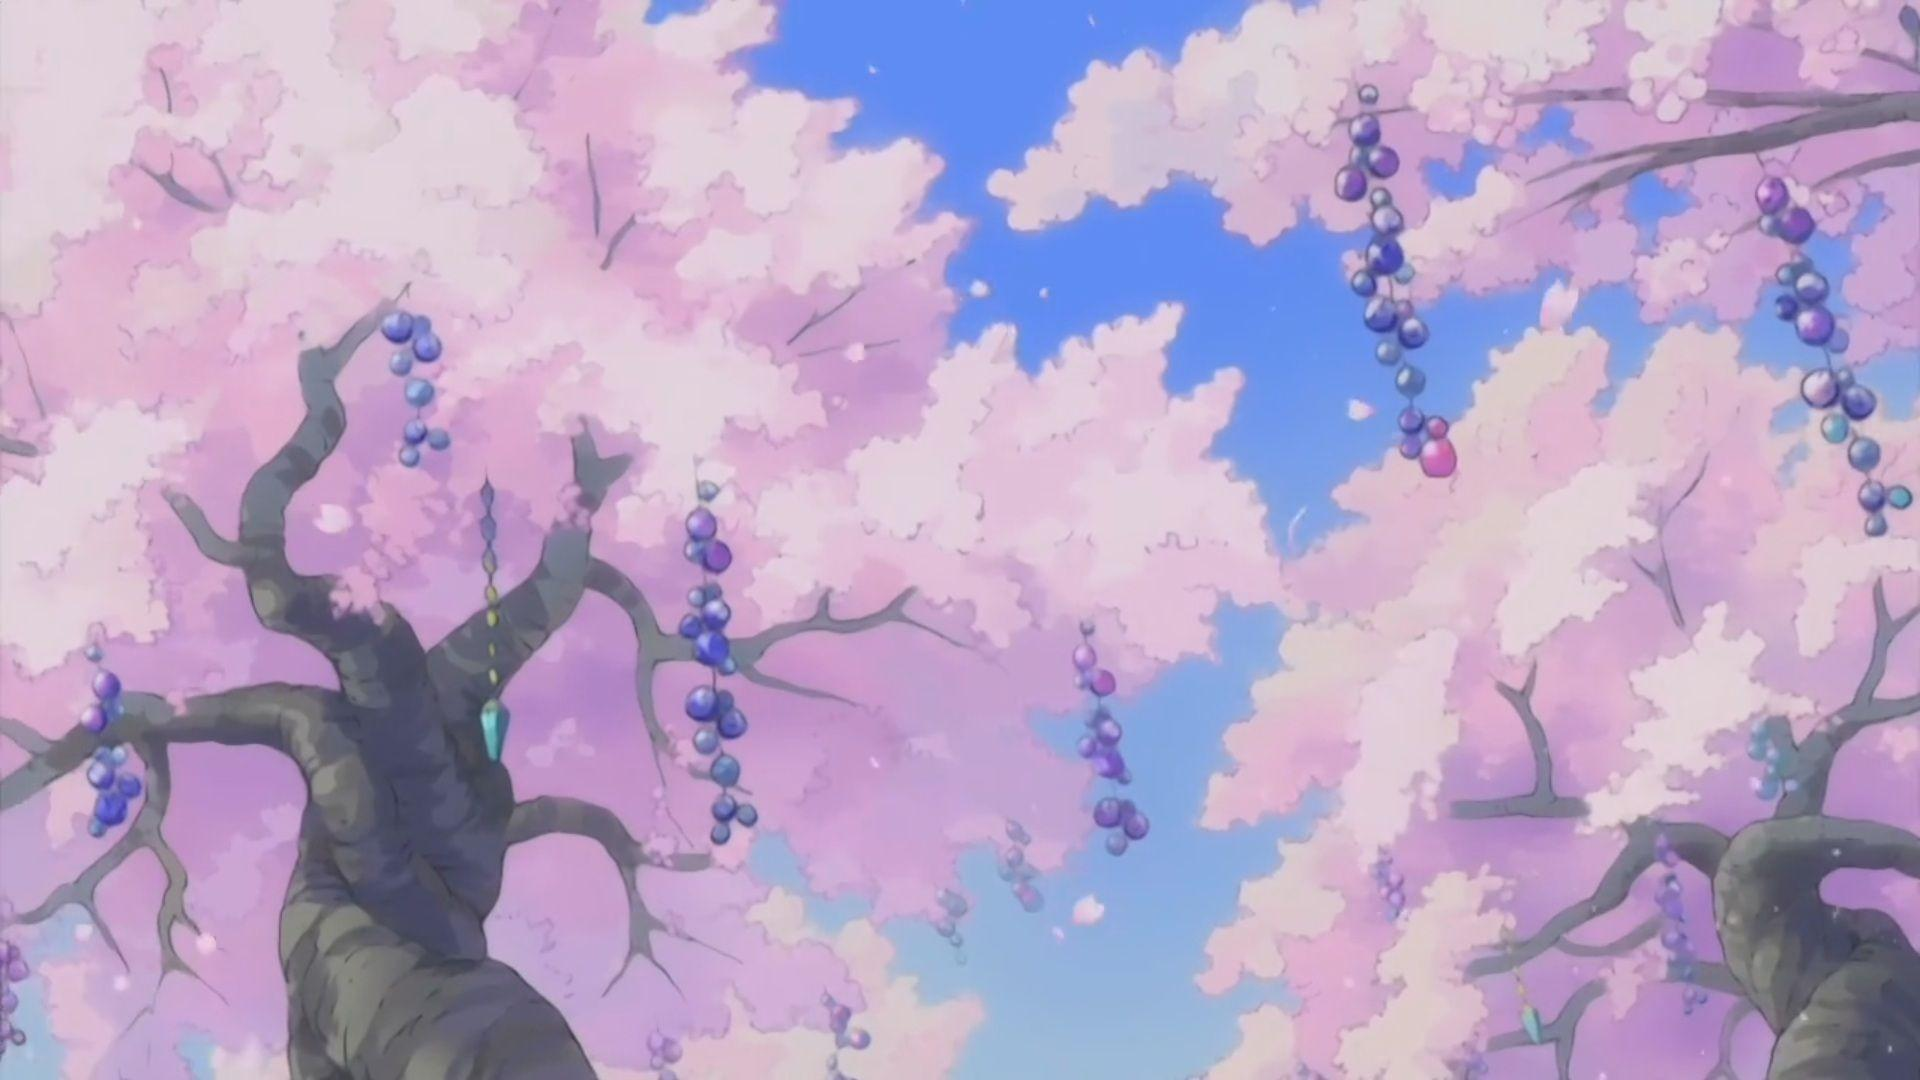 Pink Anime Aesthetic Desktop Wallpapers - Top Free Pink ...